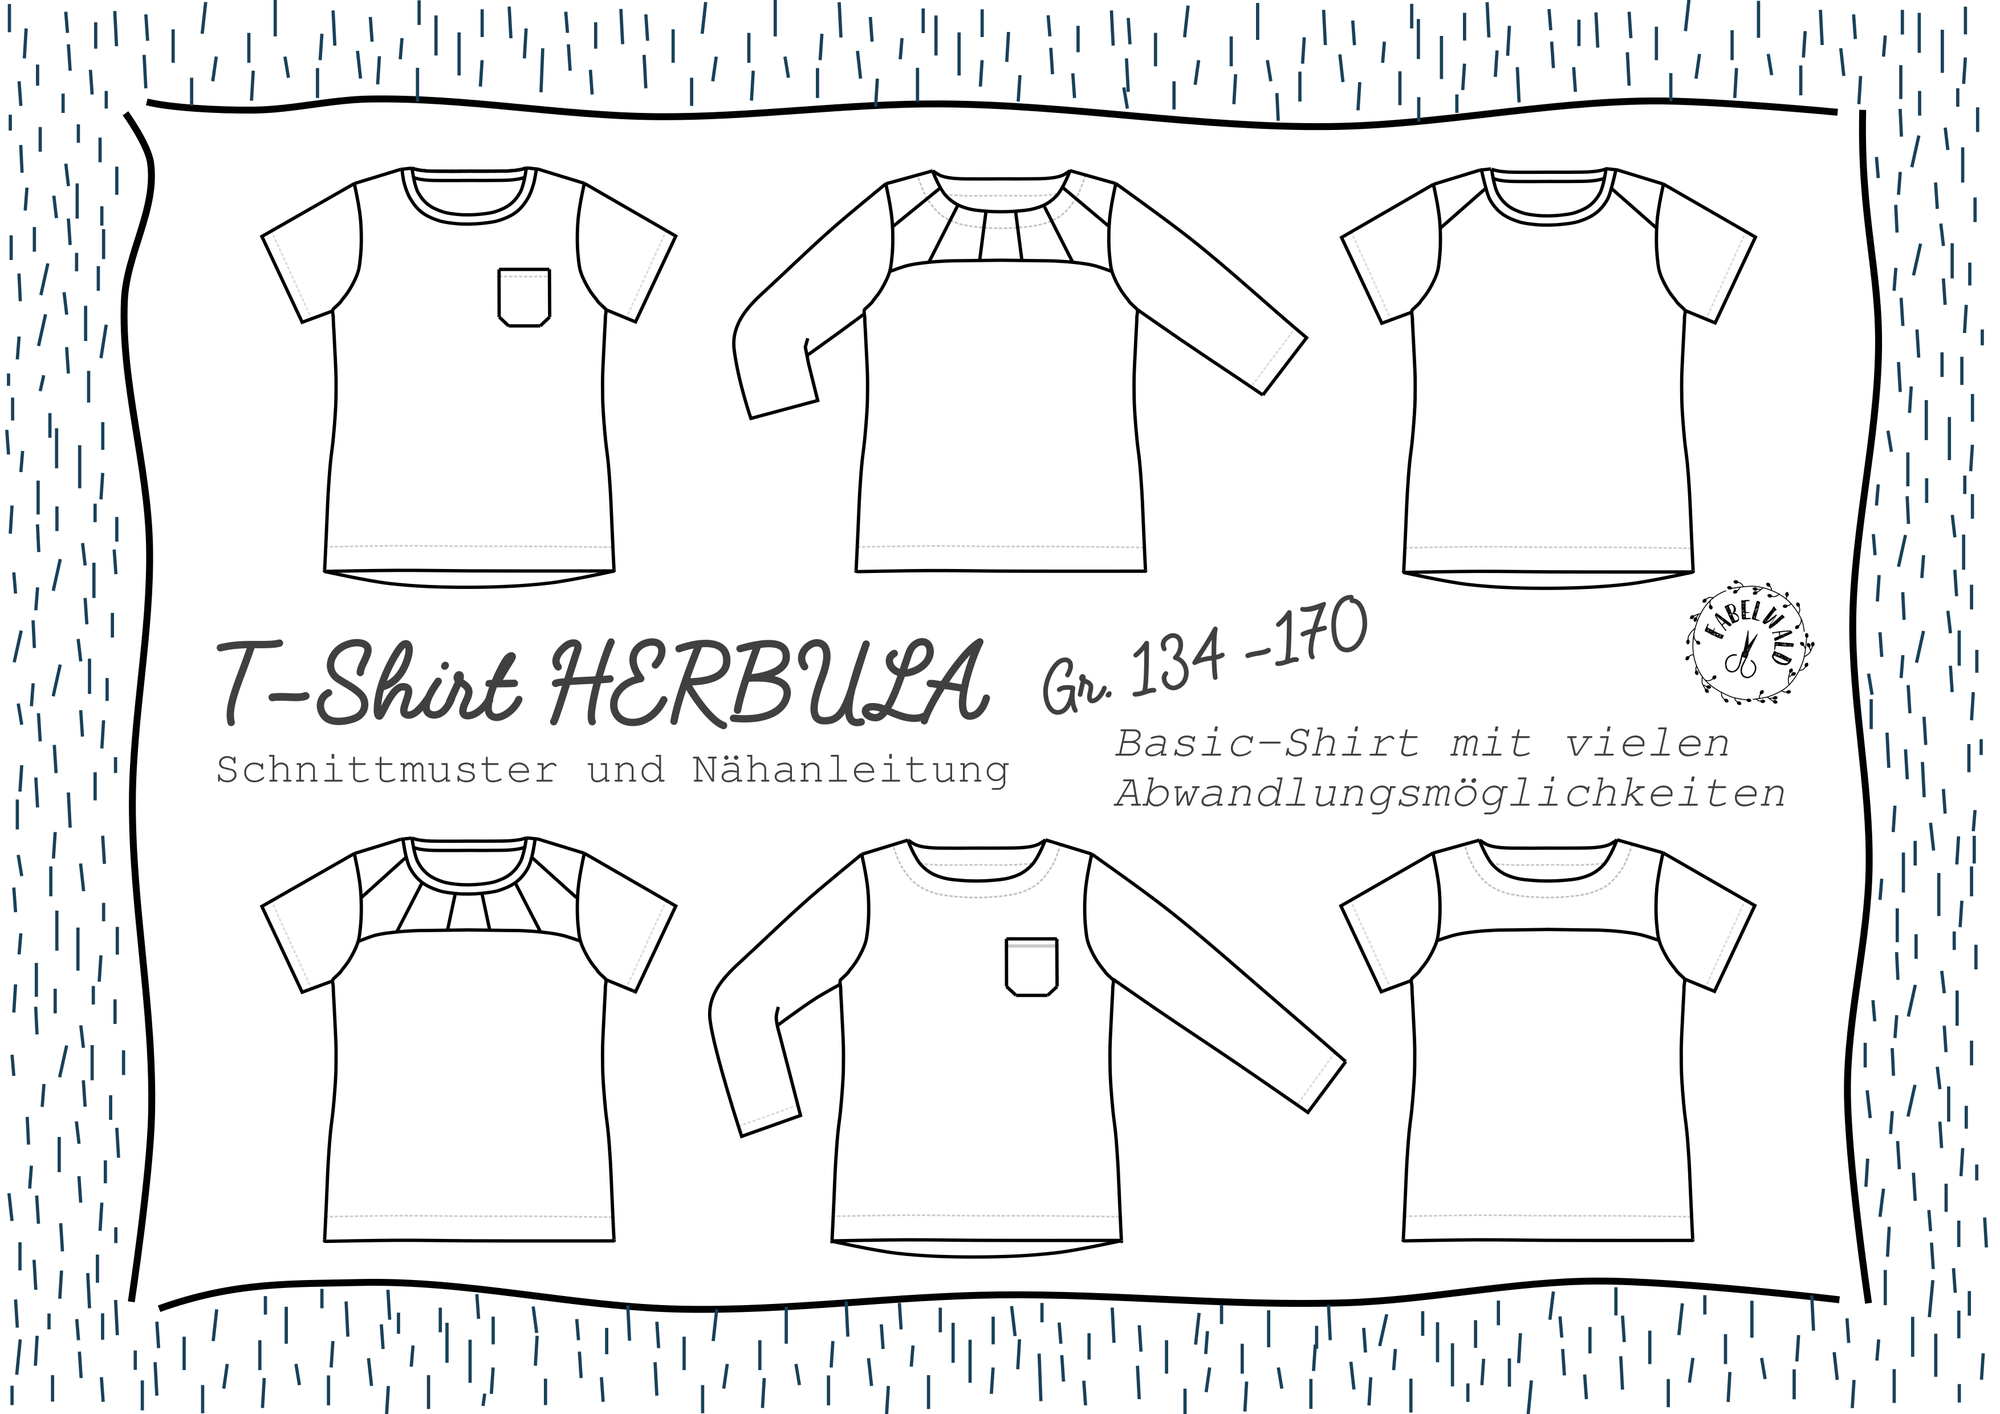 Neues Schnittmuster: T-Shirt HERBULA